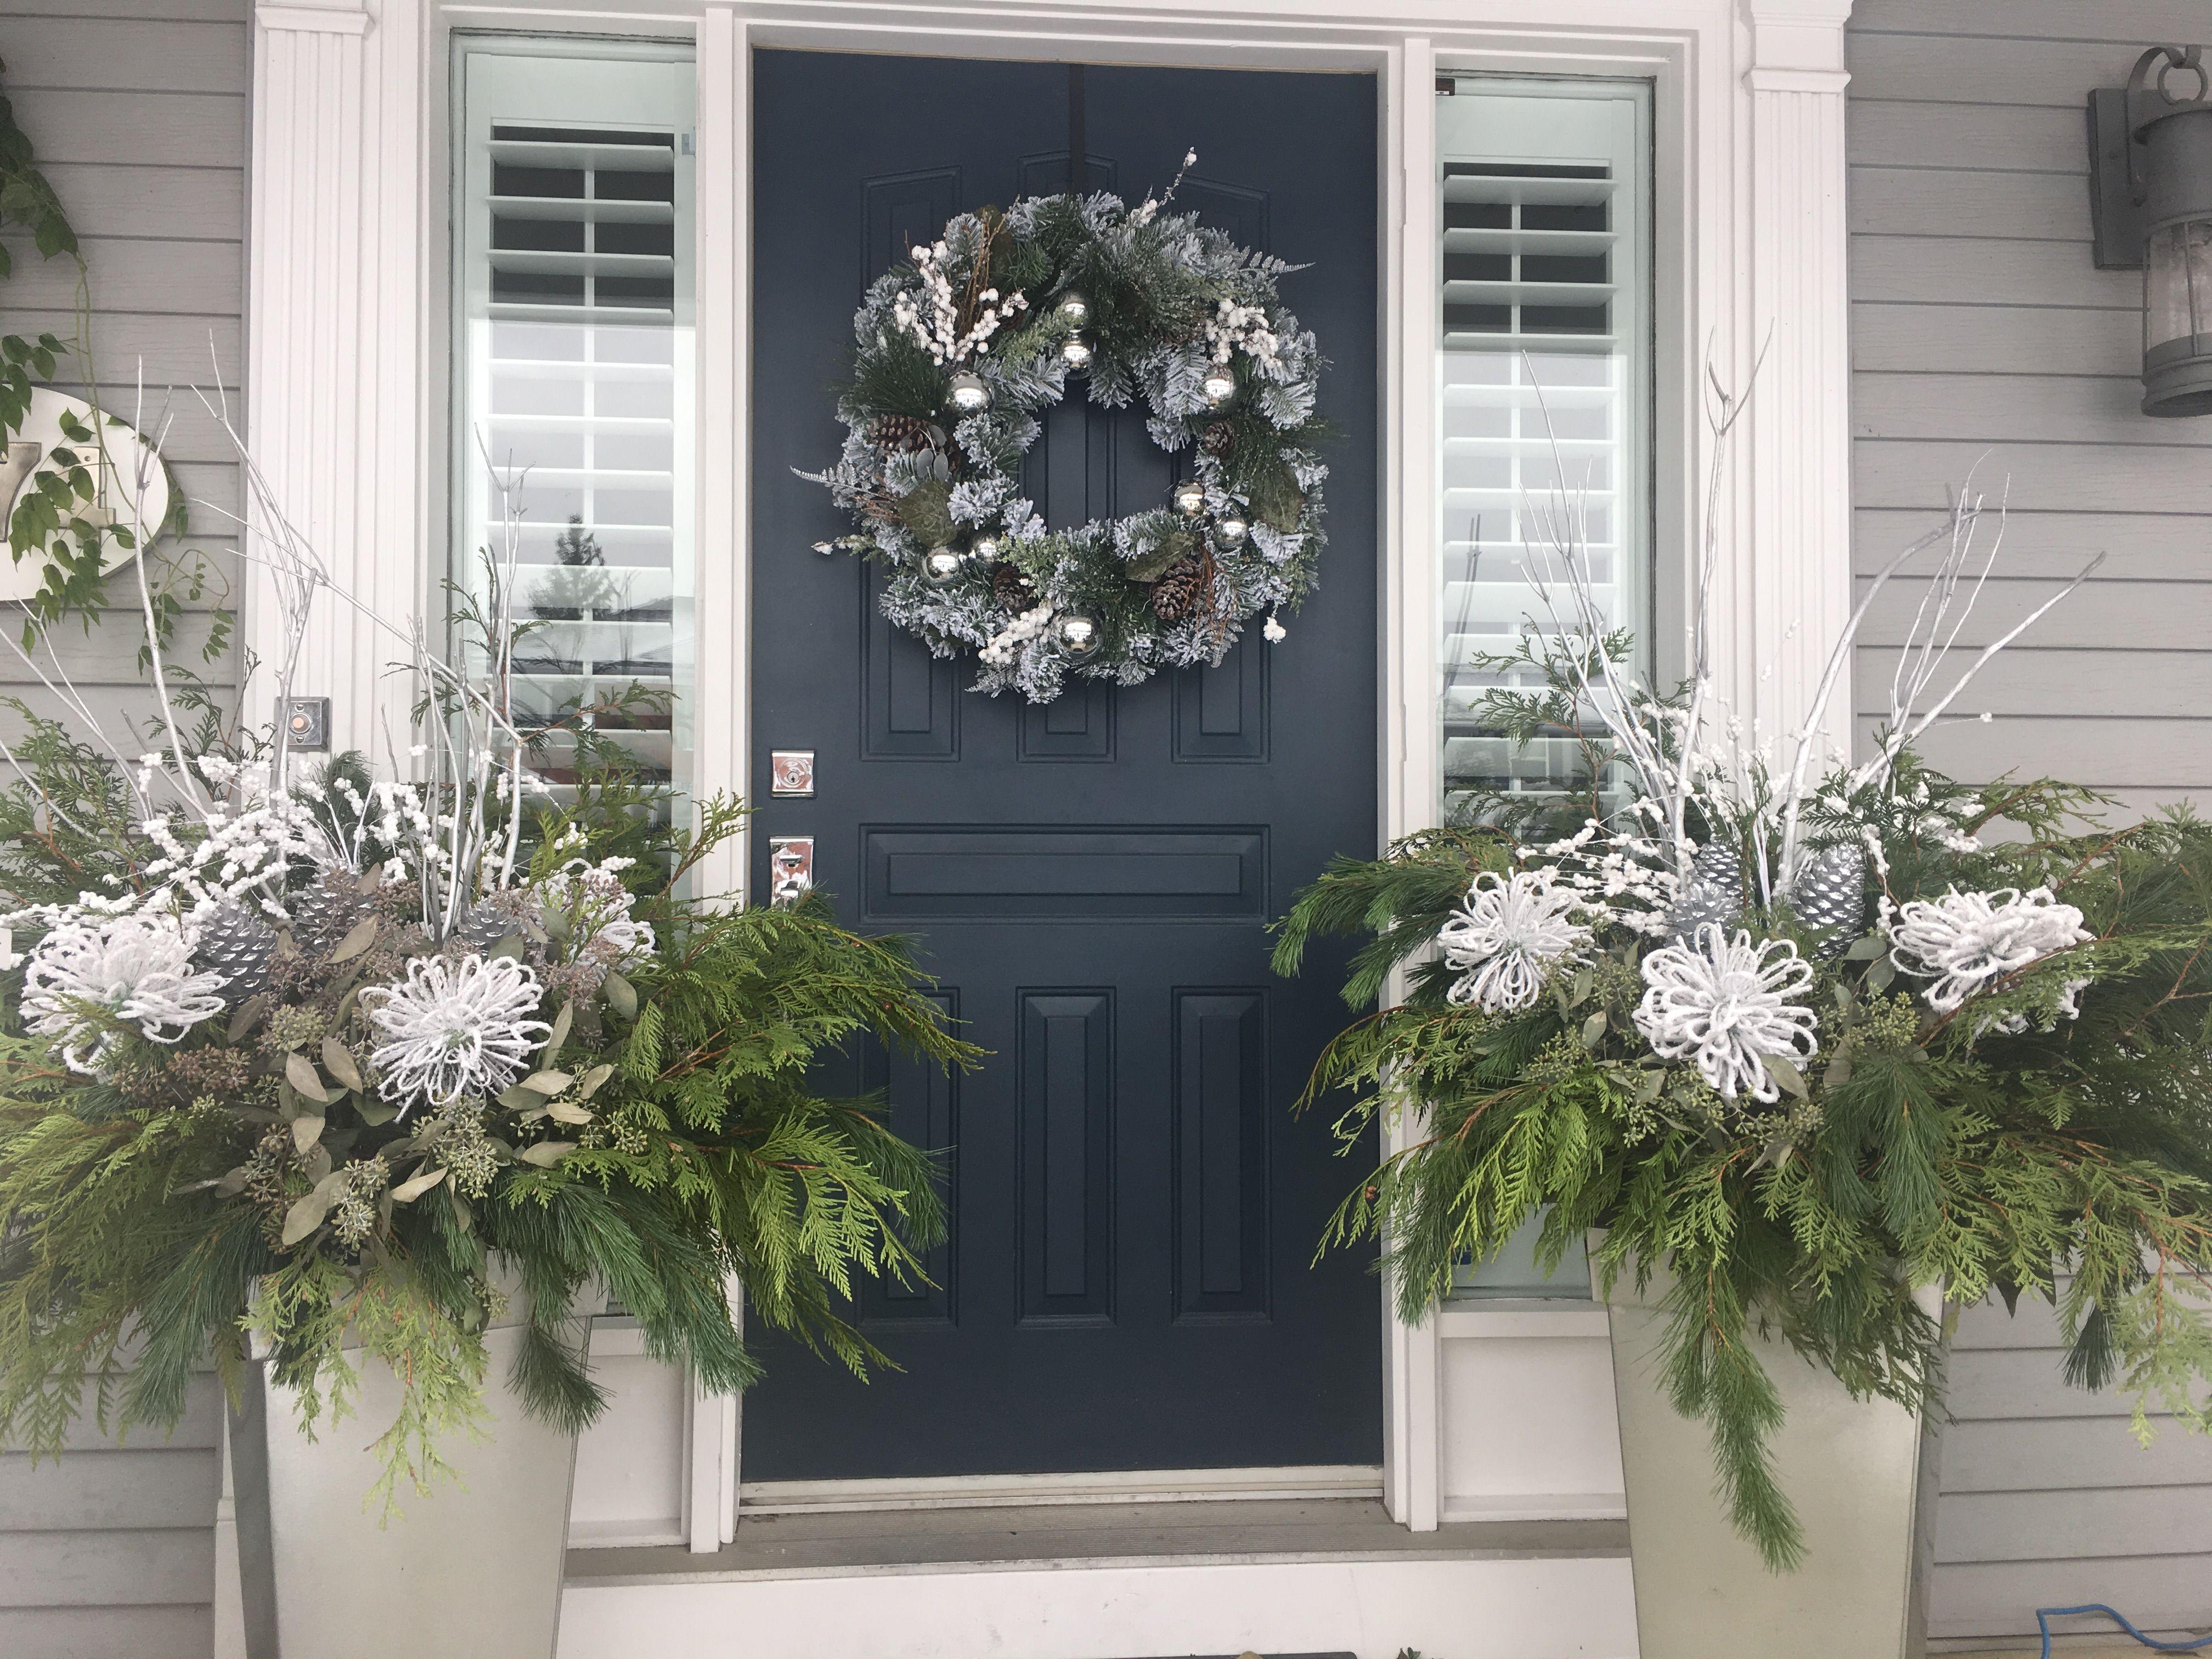 Window frame decor with wreath  pin by kim perkins on christmas  pinterest  christmas